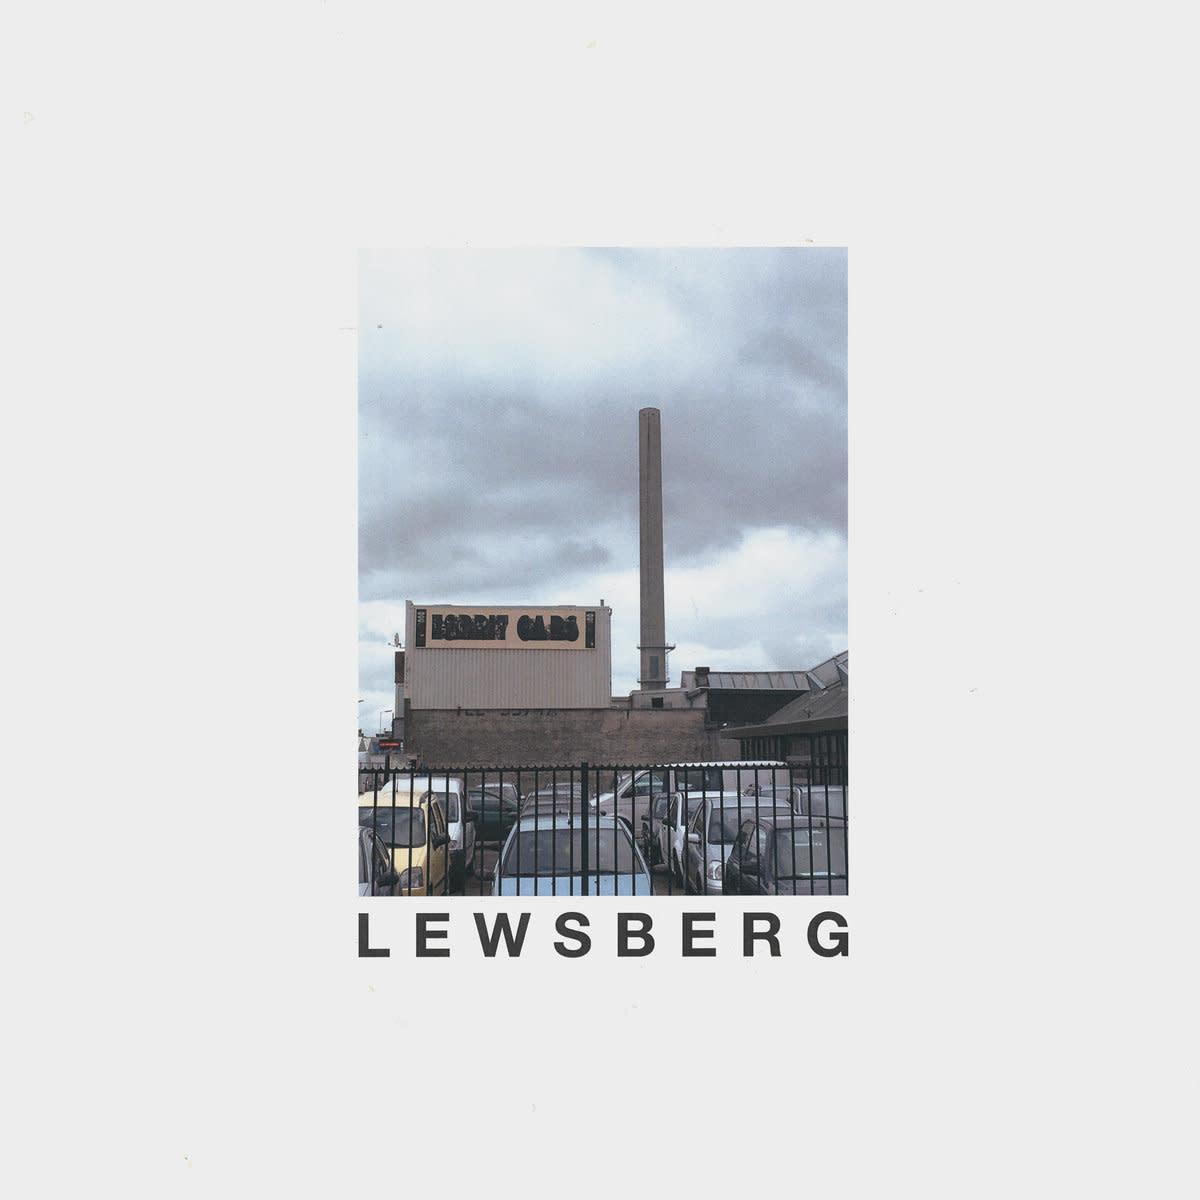 Lewsberg Lewsberg - Lewsberg